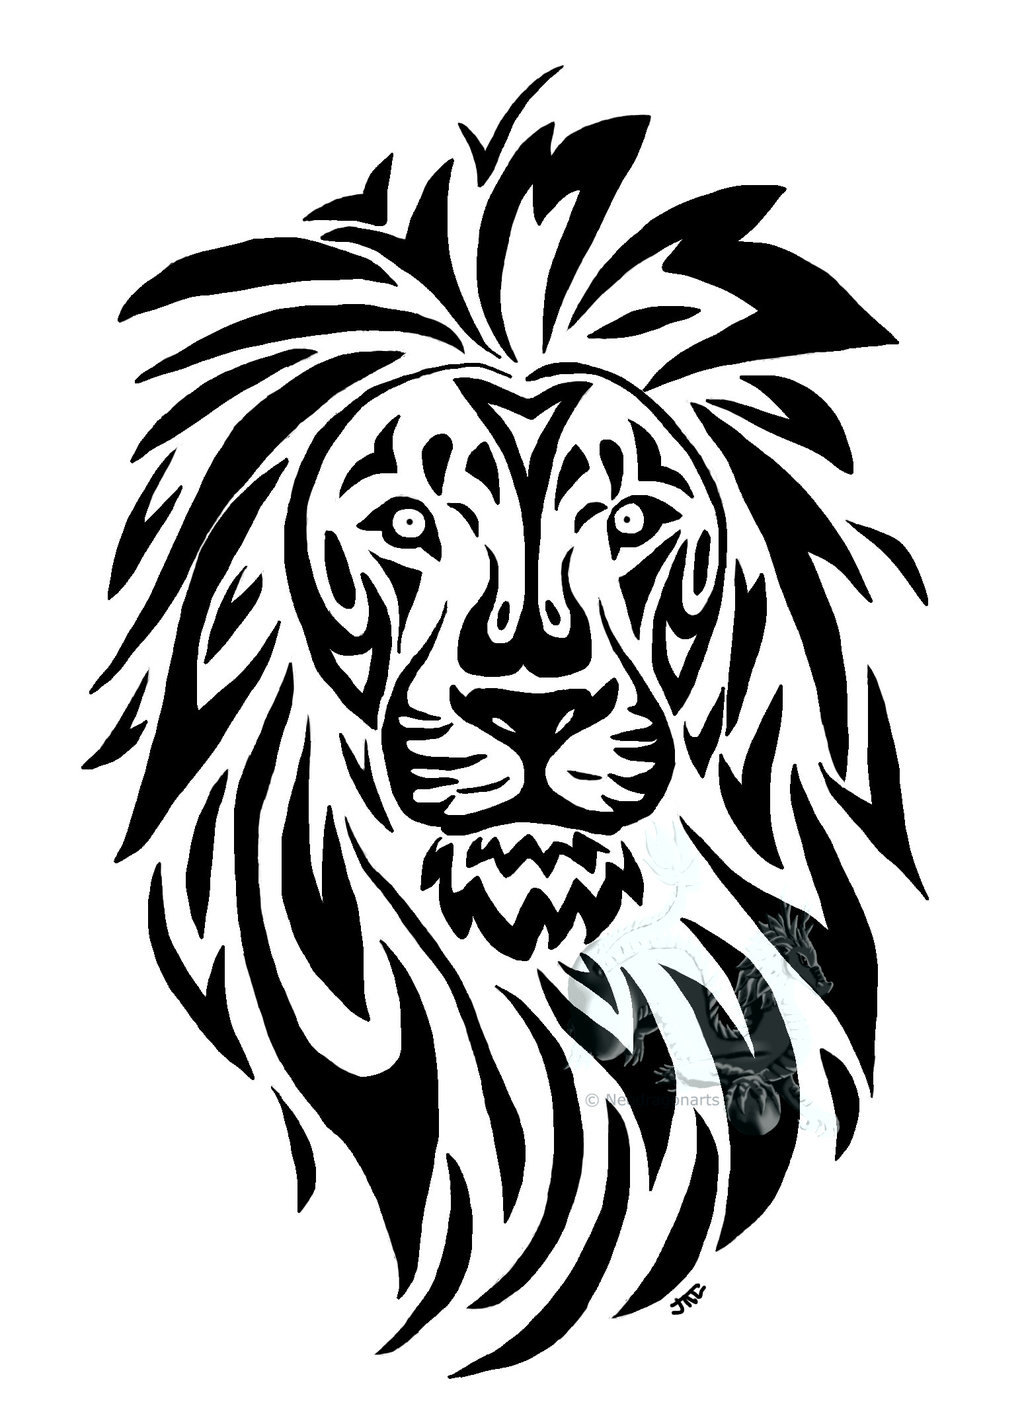 1024x1402 King Of The Jungle Illusion Knitting Pattern, Lion Shadow Knitting